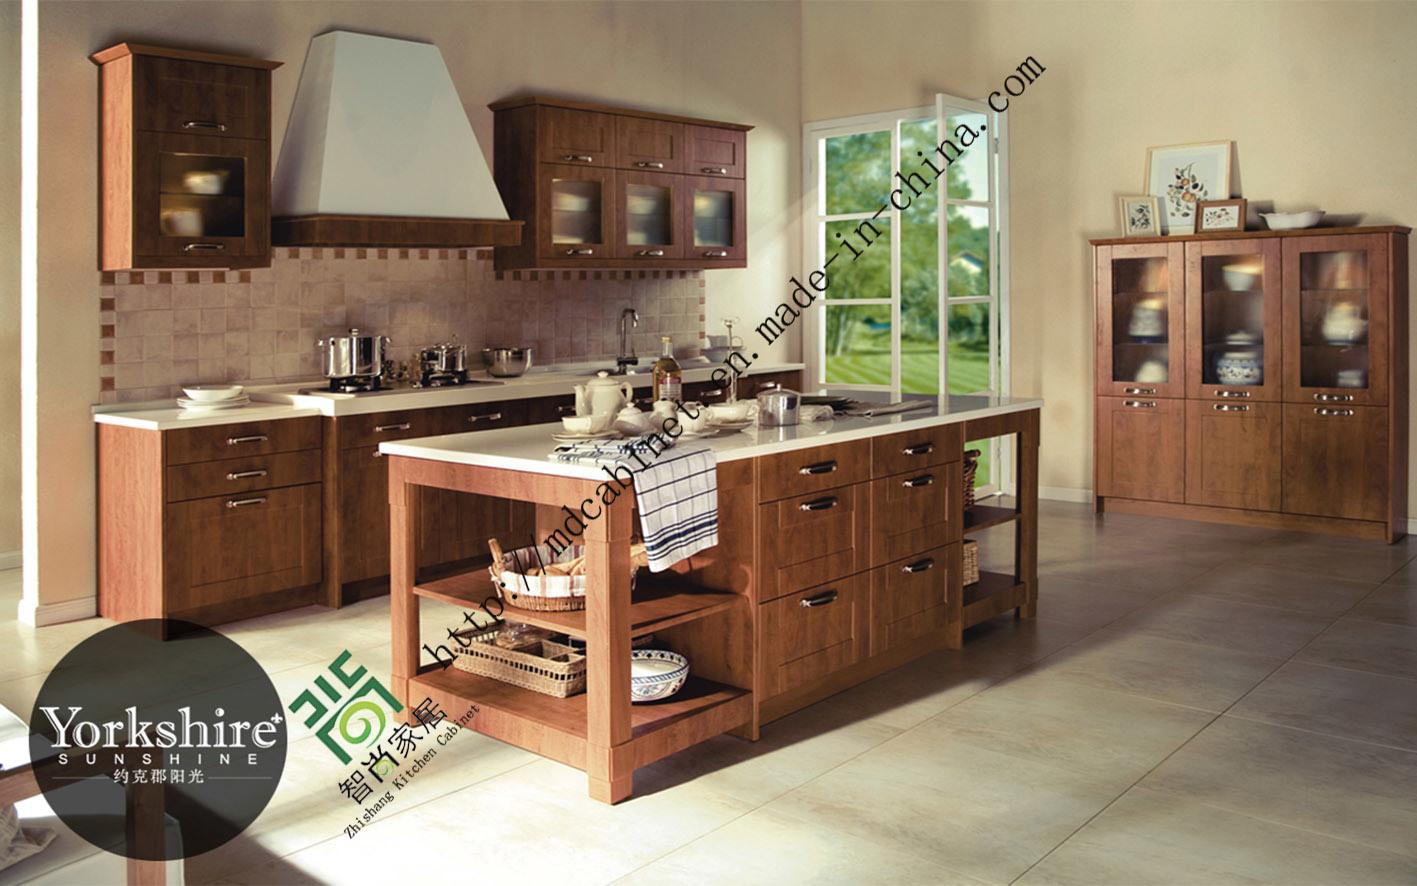 Mdf muebles de madera cl sica sala de estar mdf muebles for Muebles en madera mdf